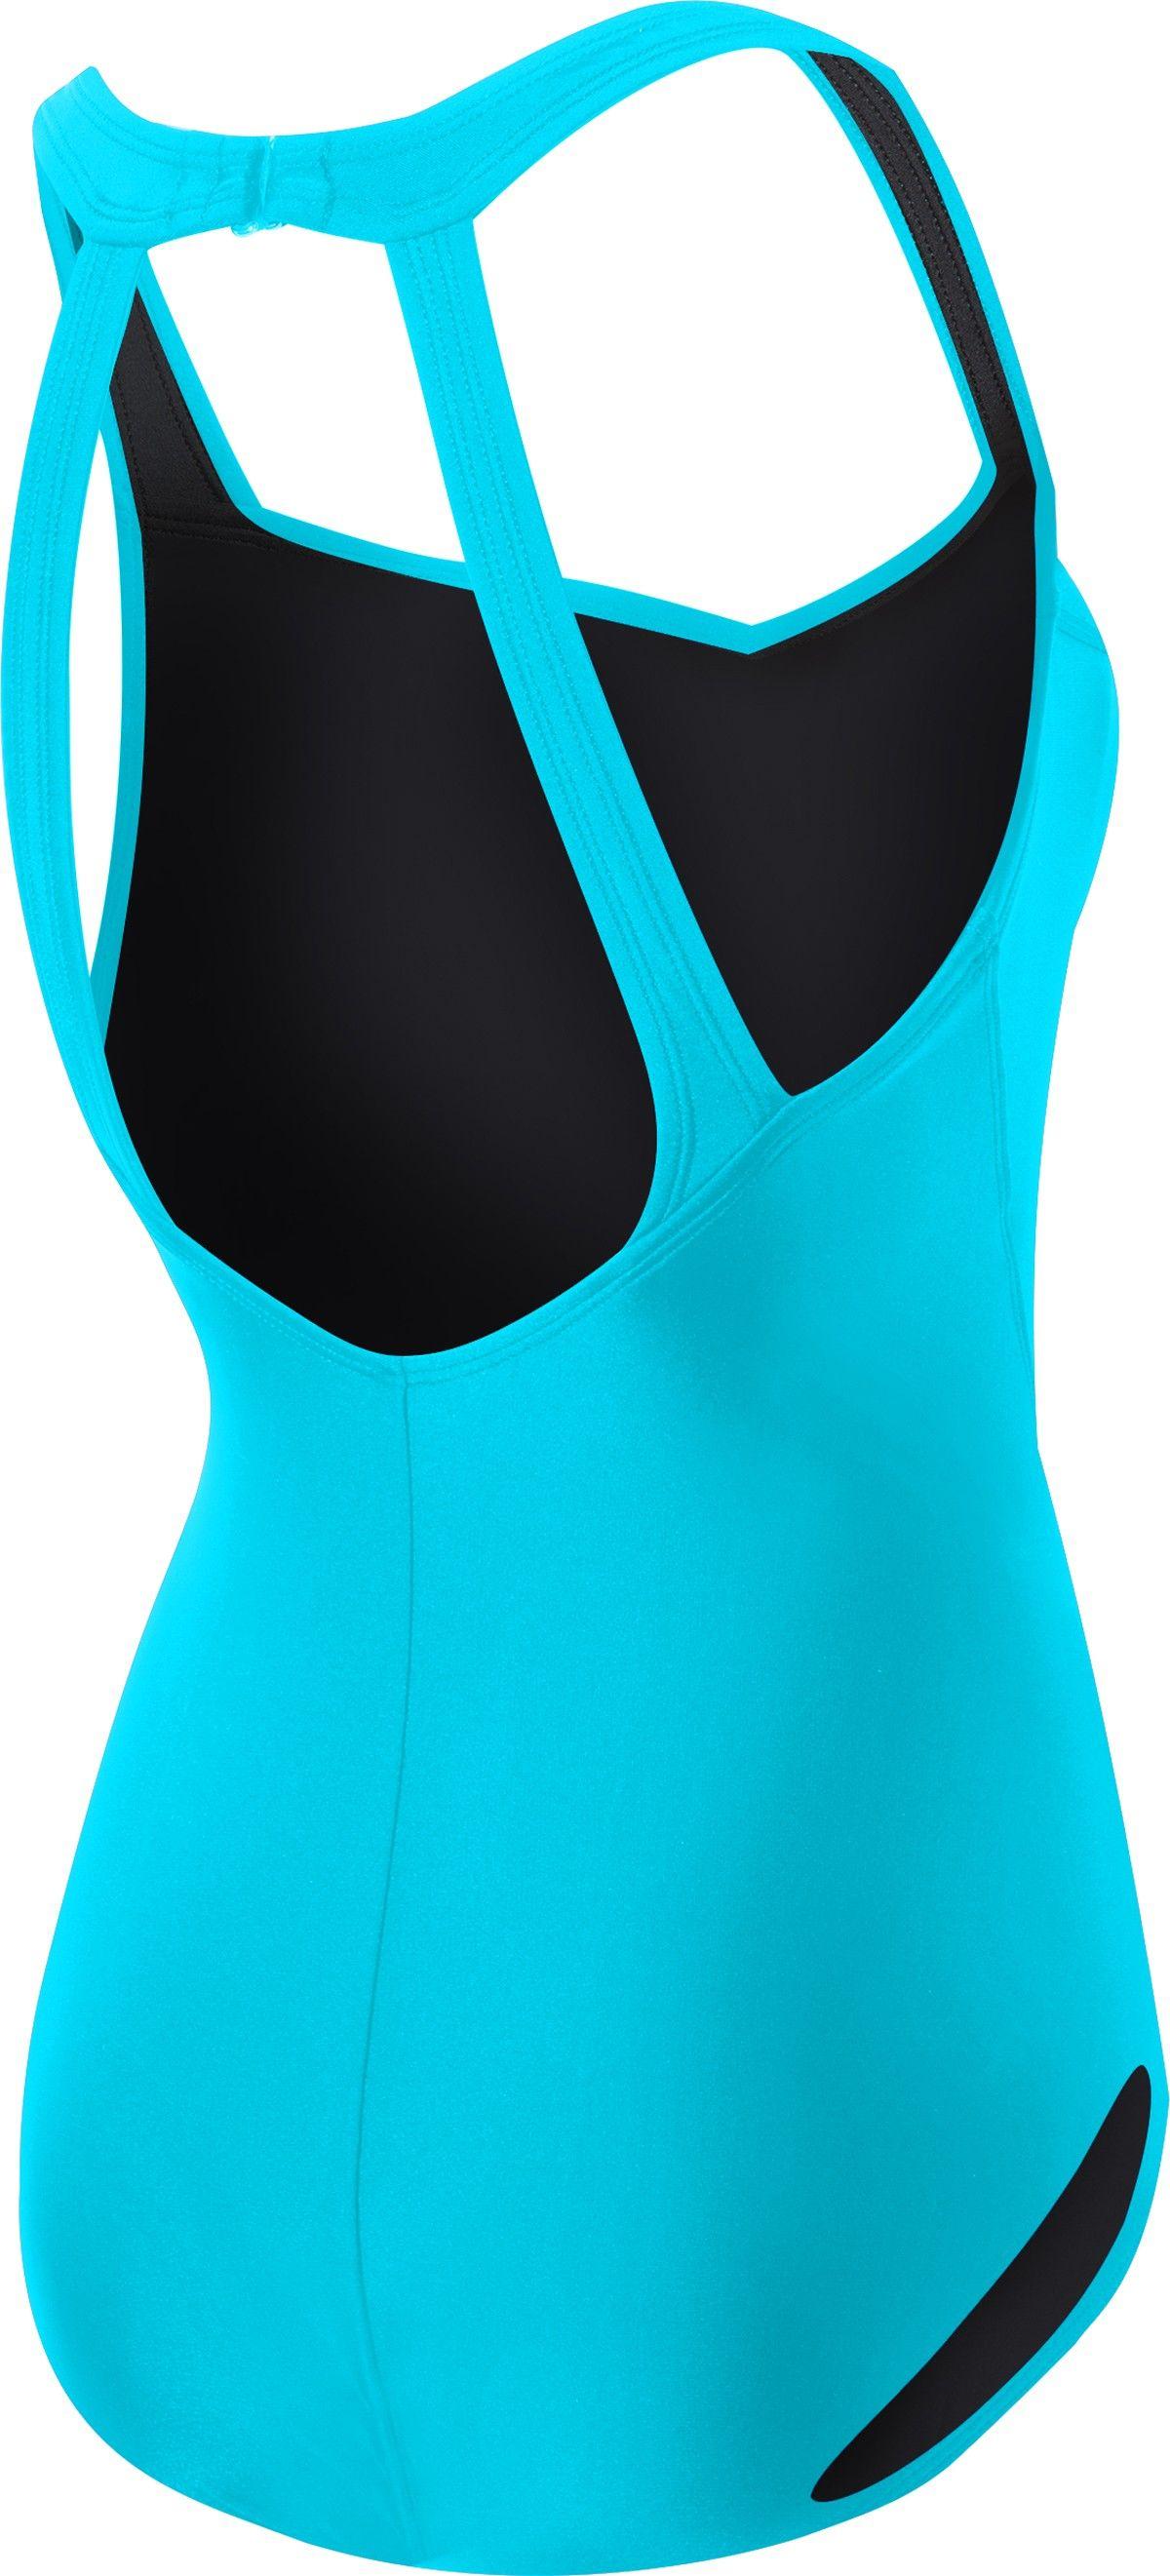 5286769c152c3 Women s Solid Halter Controlfit Swimsuit